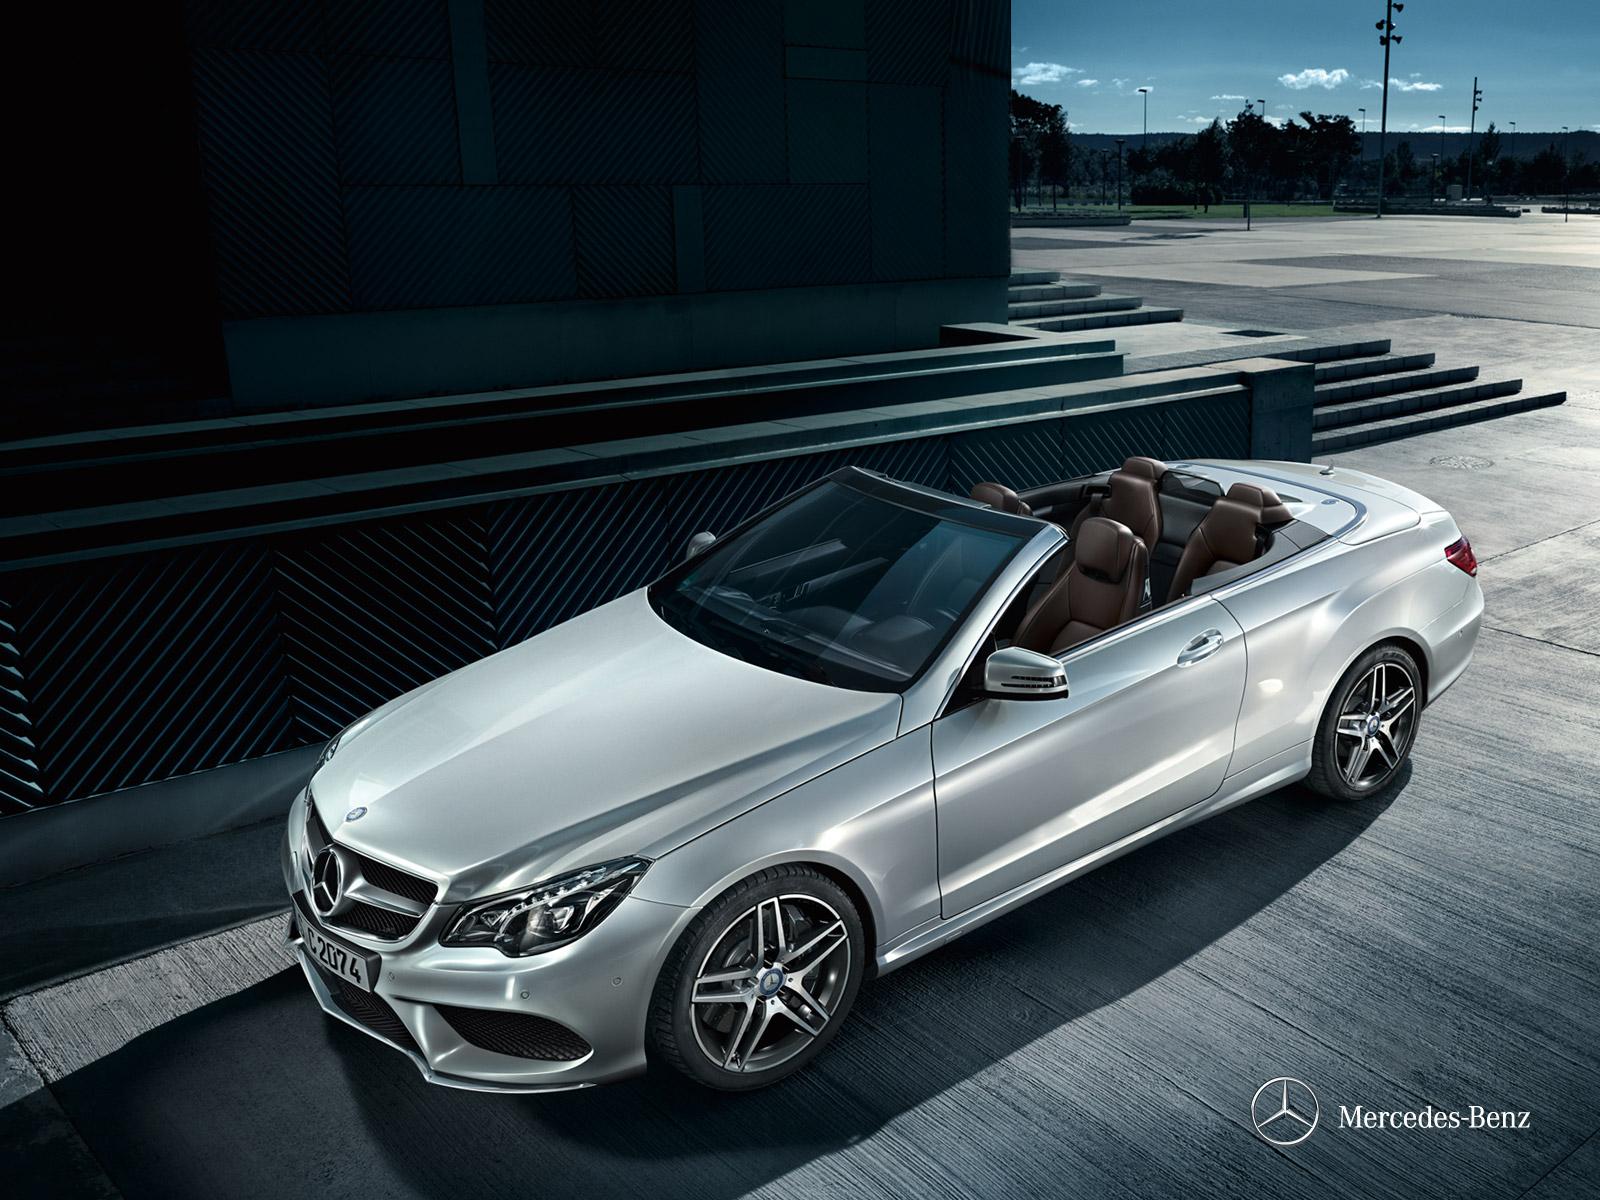 Our dream cars 2014 mercedes benz e class cabriolet for Mercedes benz convertible 2014